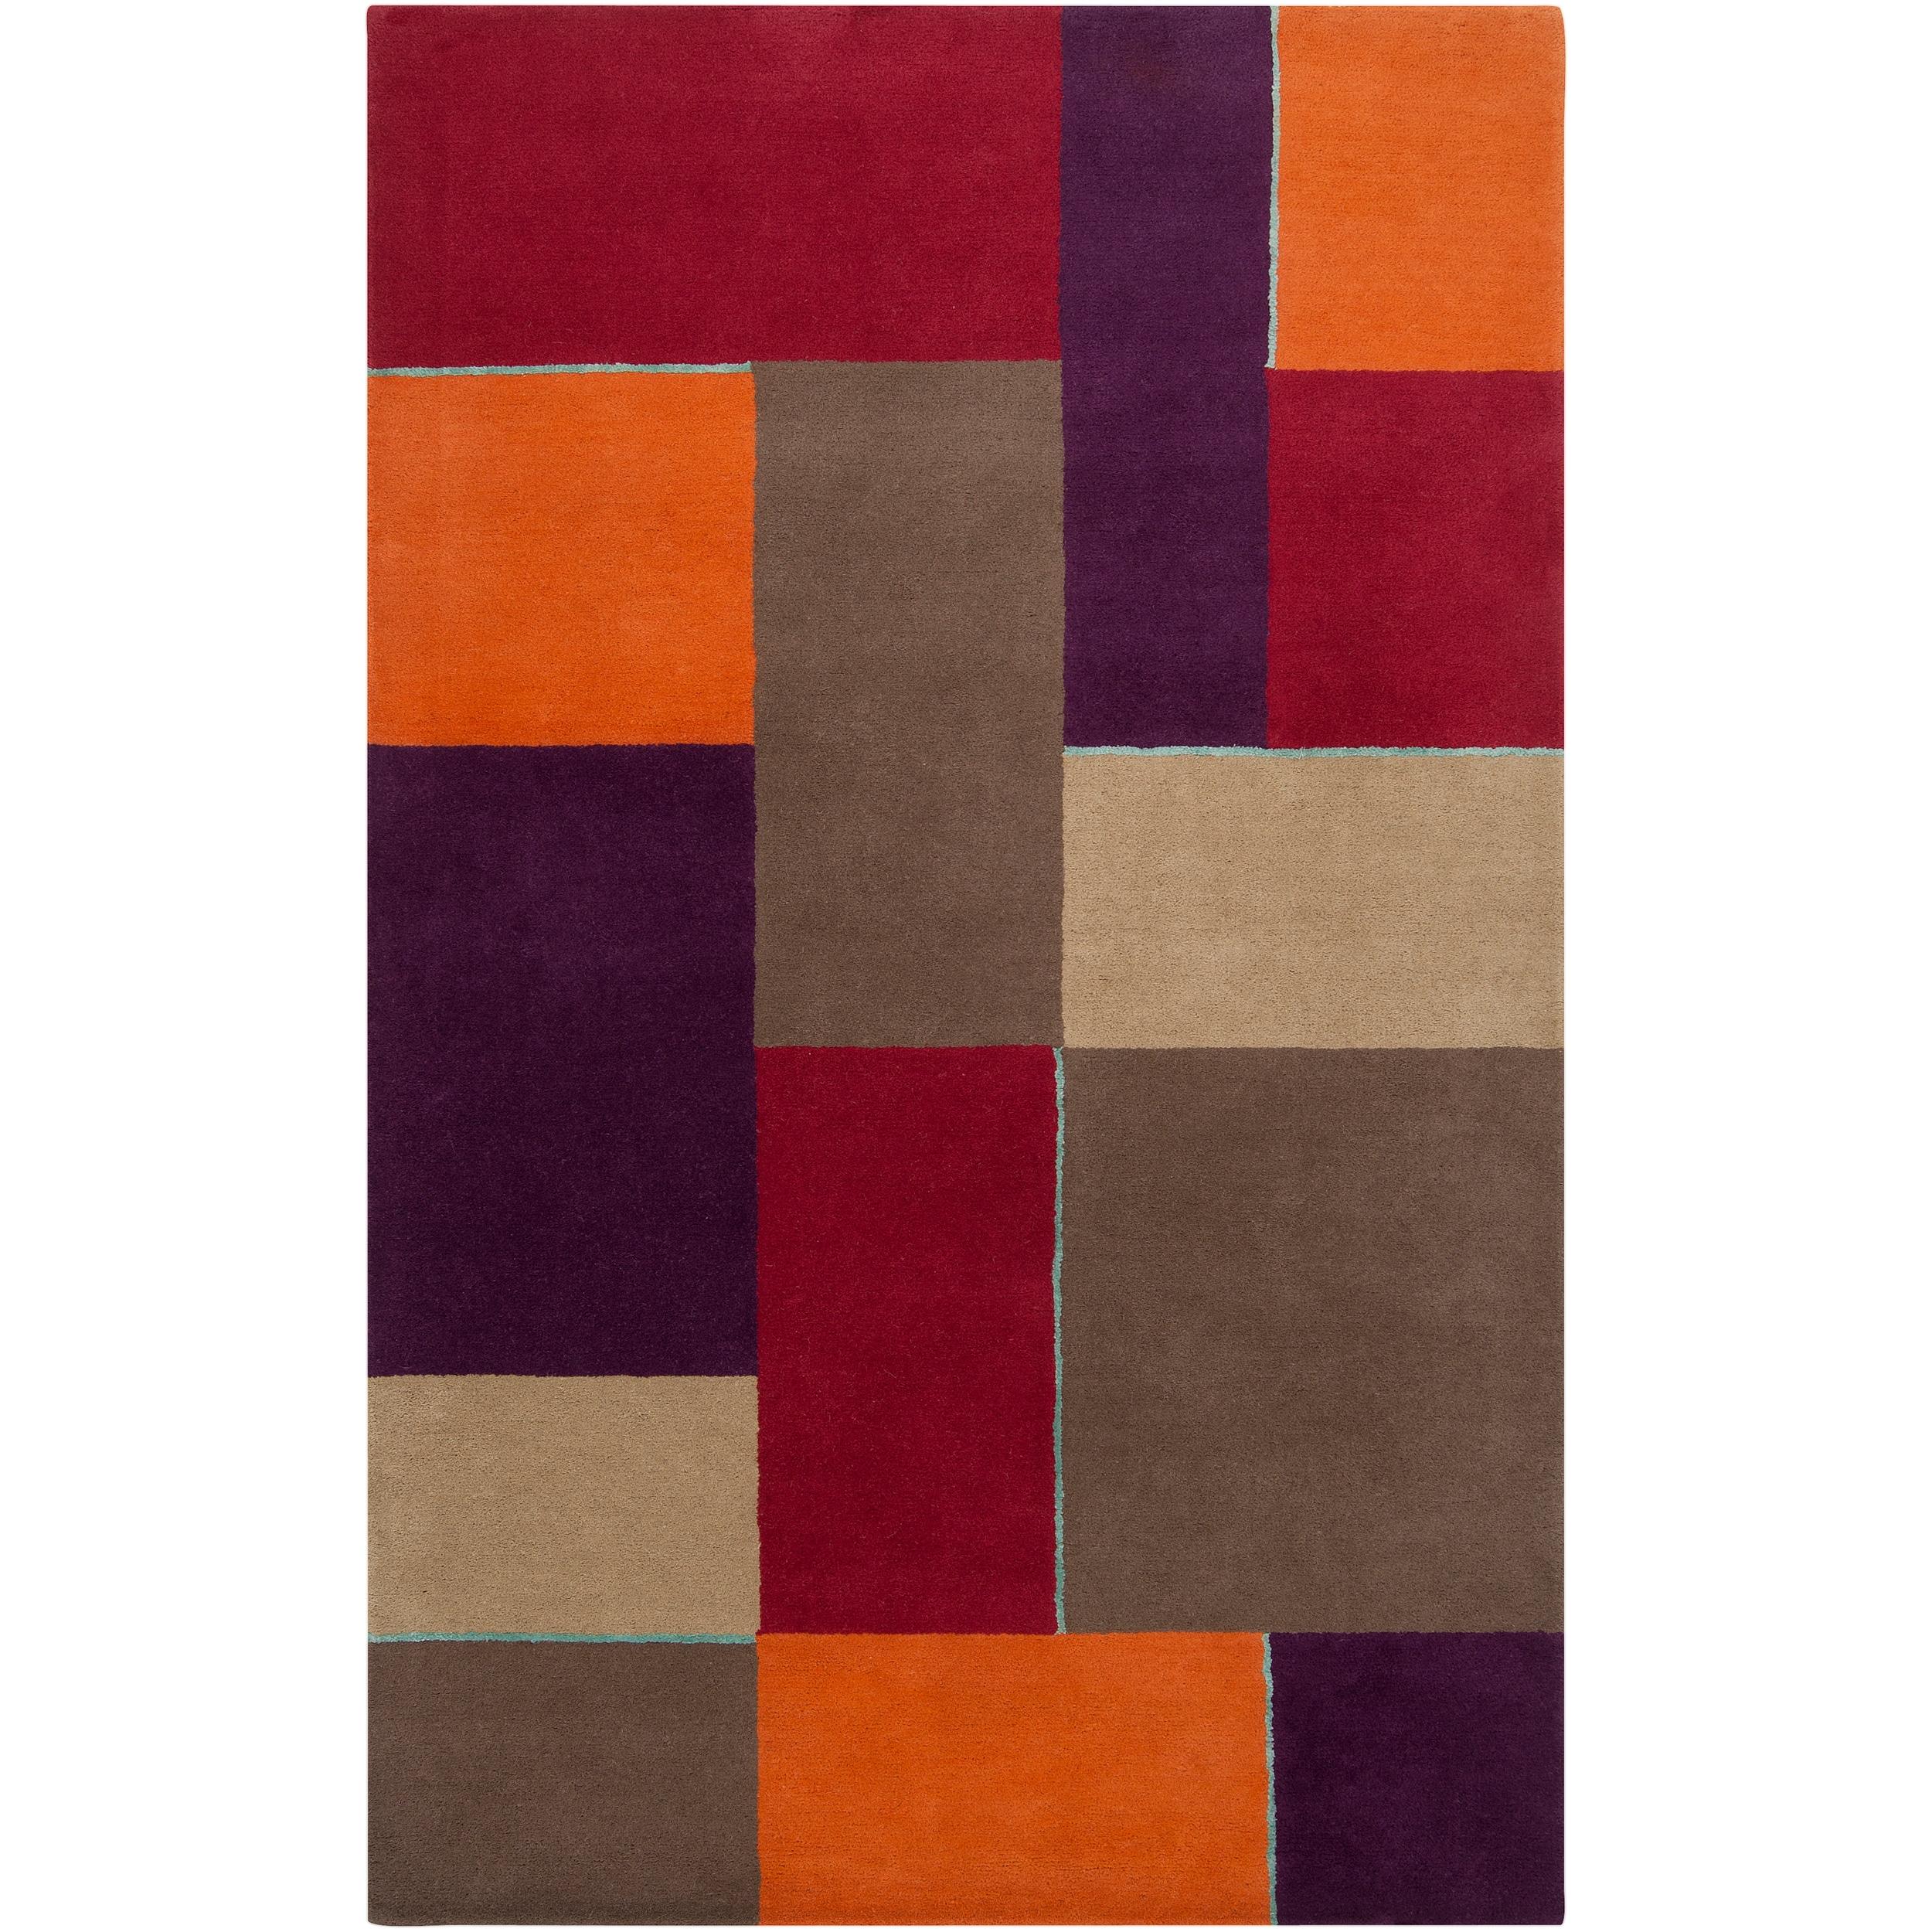 Hand-tufted Gray Diego Martin Geometric Pattern Wool Area Rug (9' x 12') - 9' x 12'